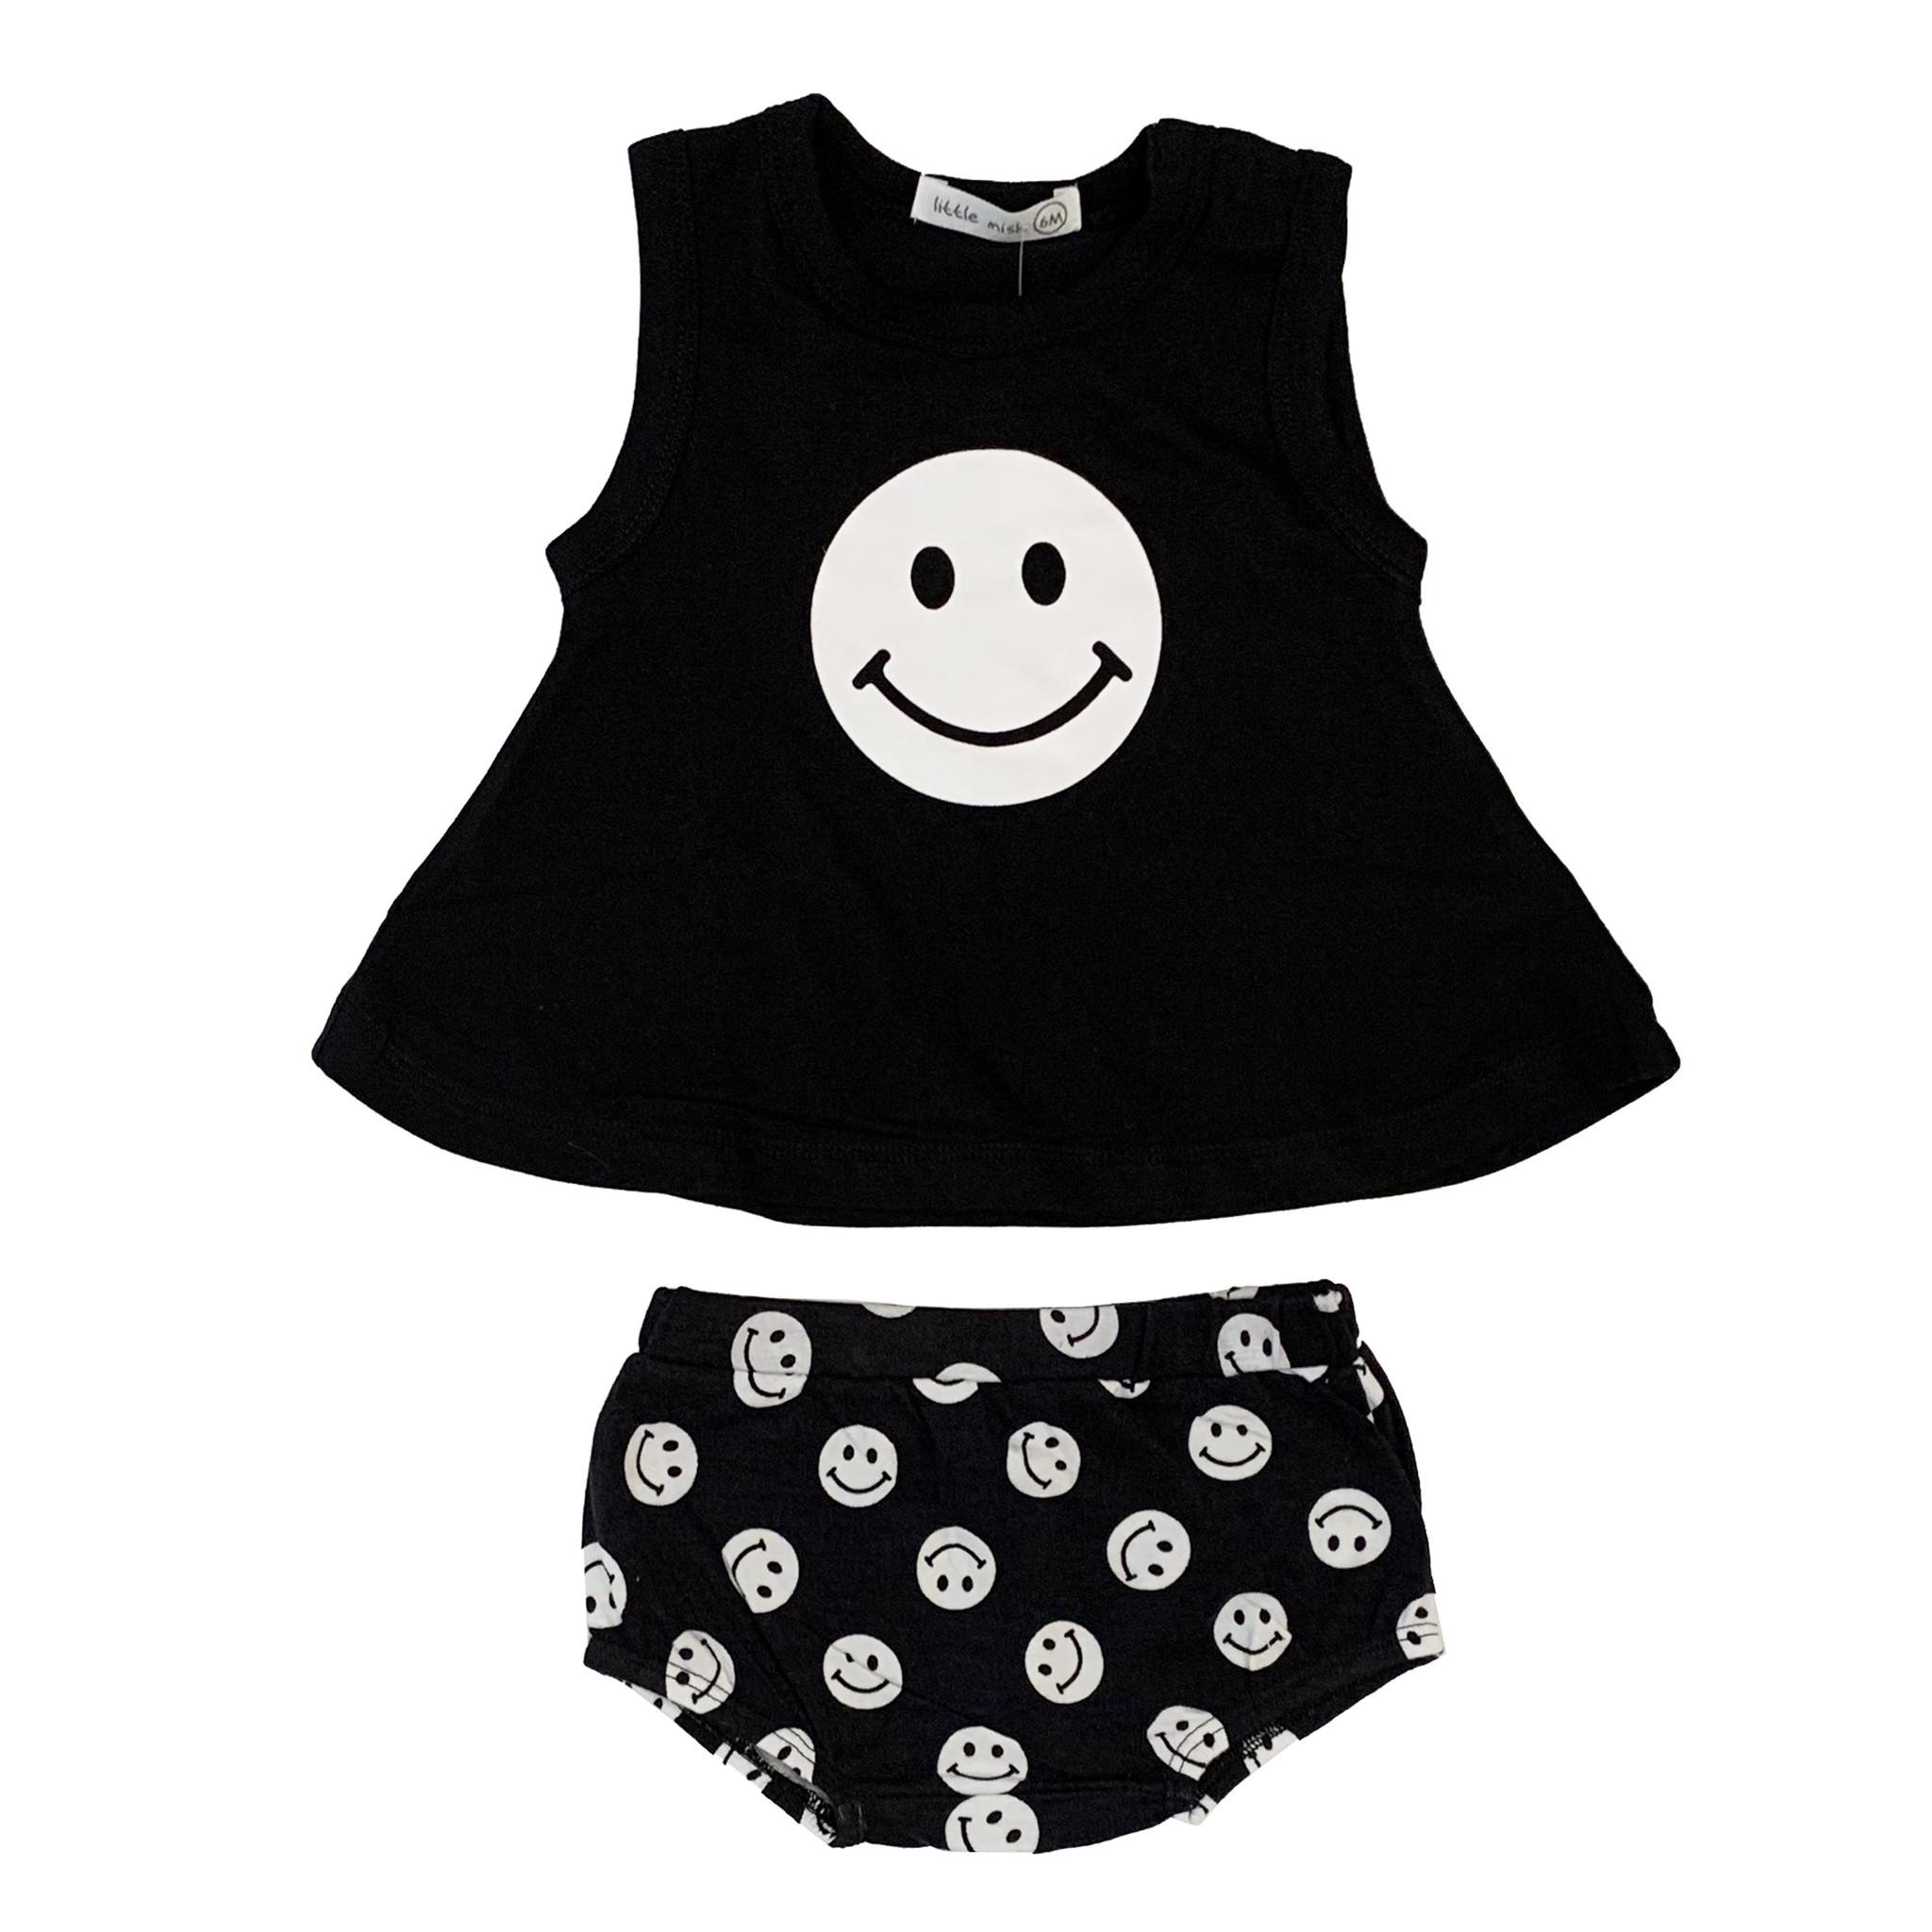 Little Mish Black Smiley Swing Diaper Set